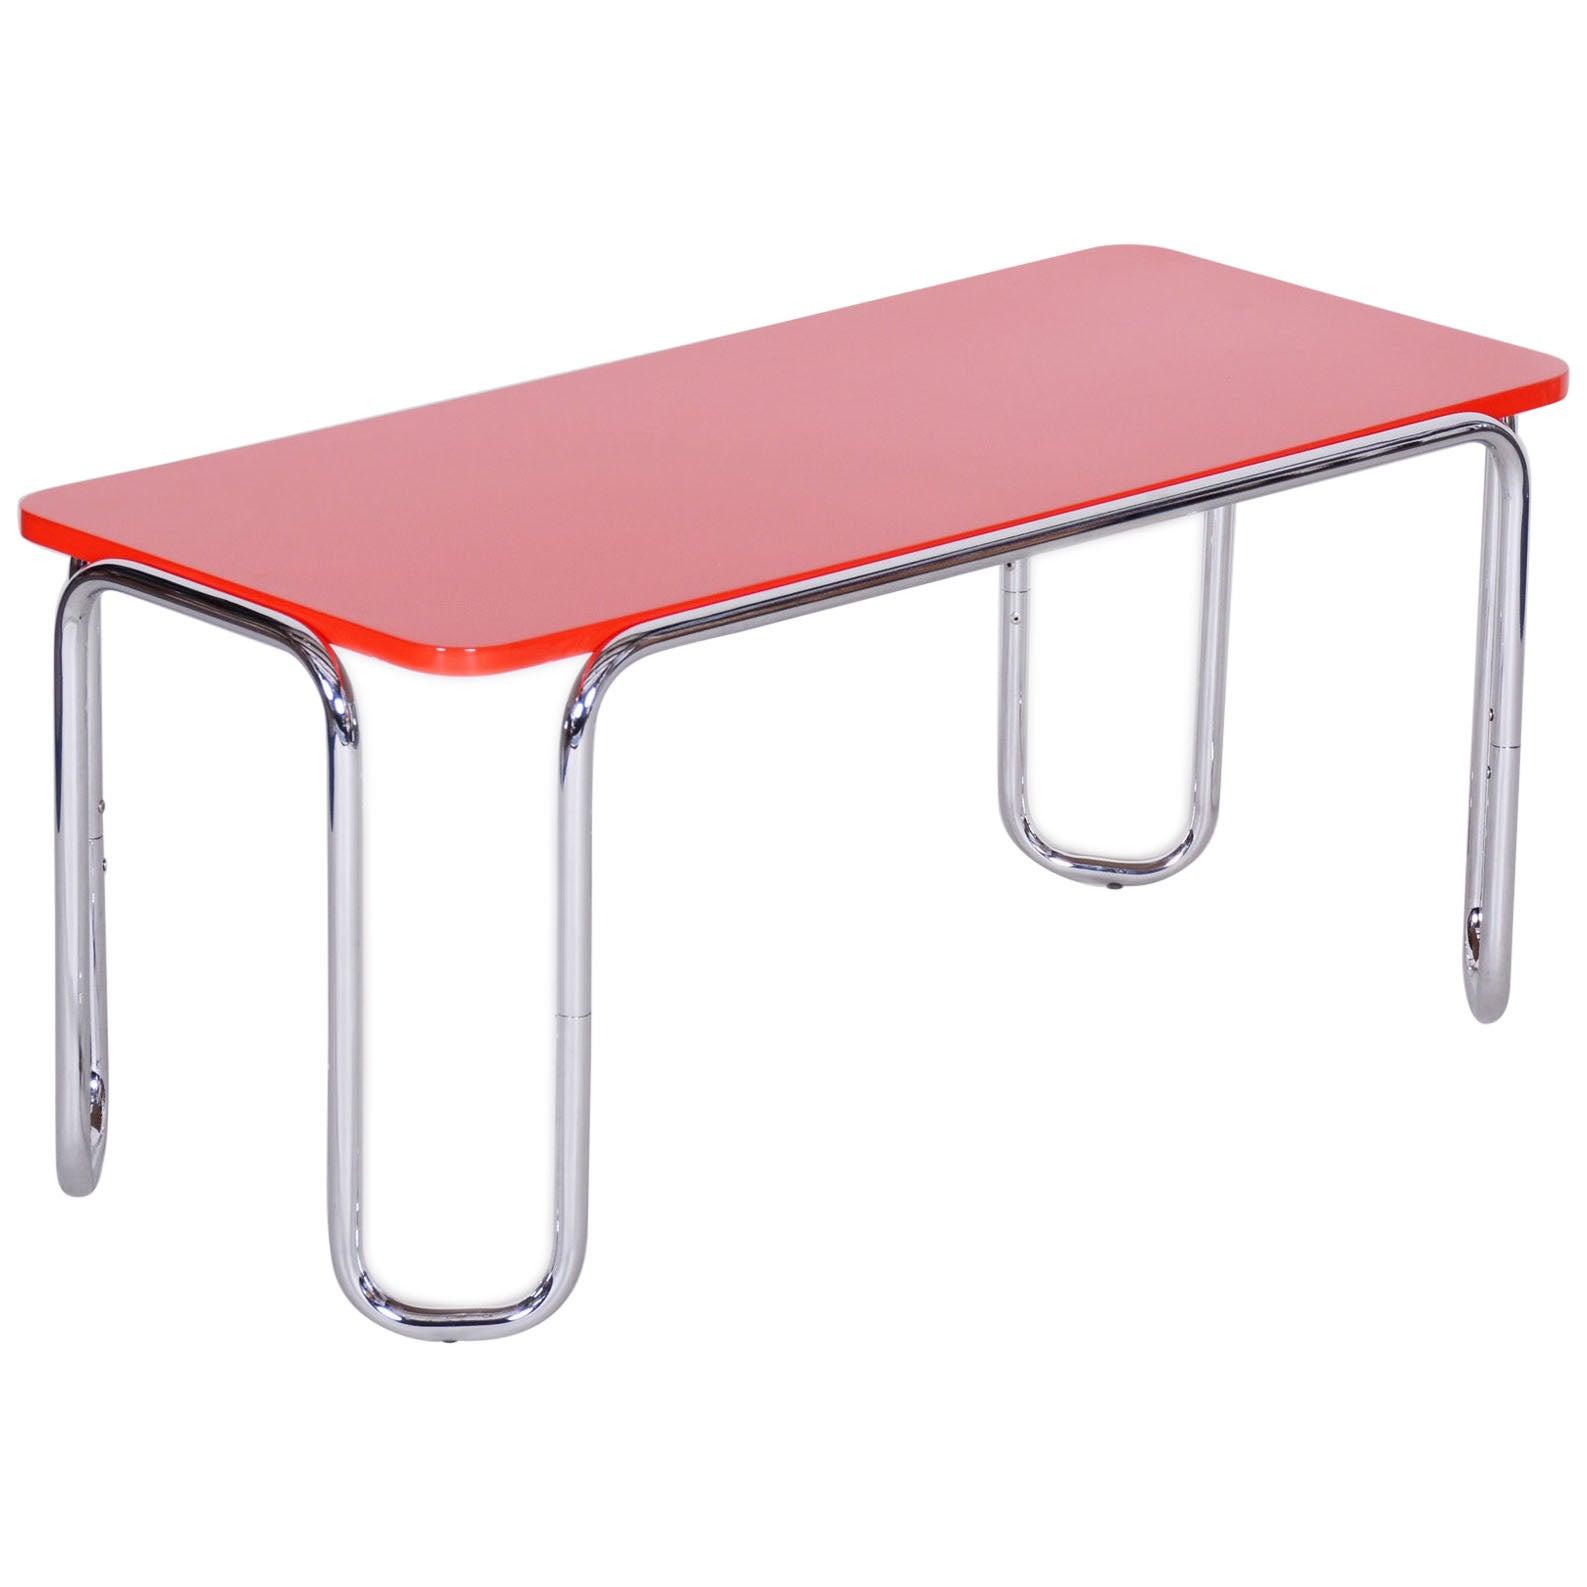 20th Century Small Red Czech Chrome Bauhaus Table by Kovona, 1950s